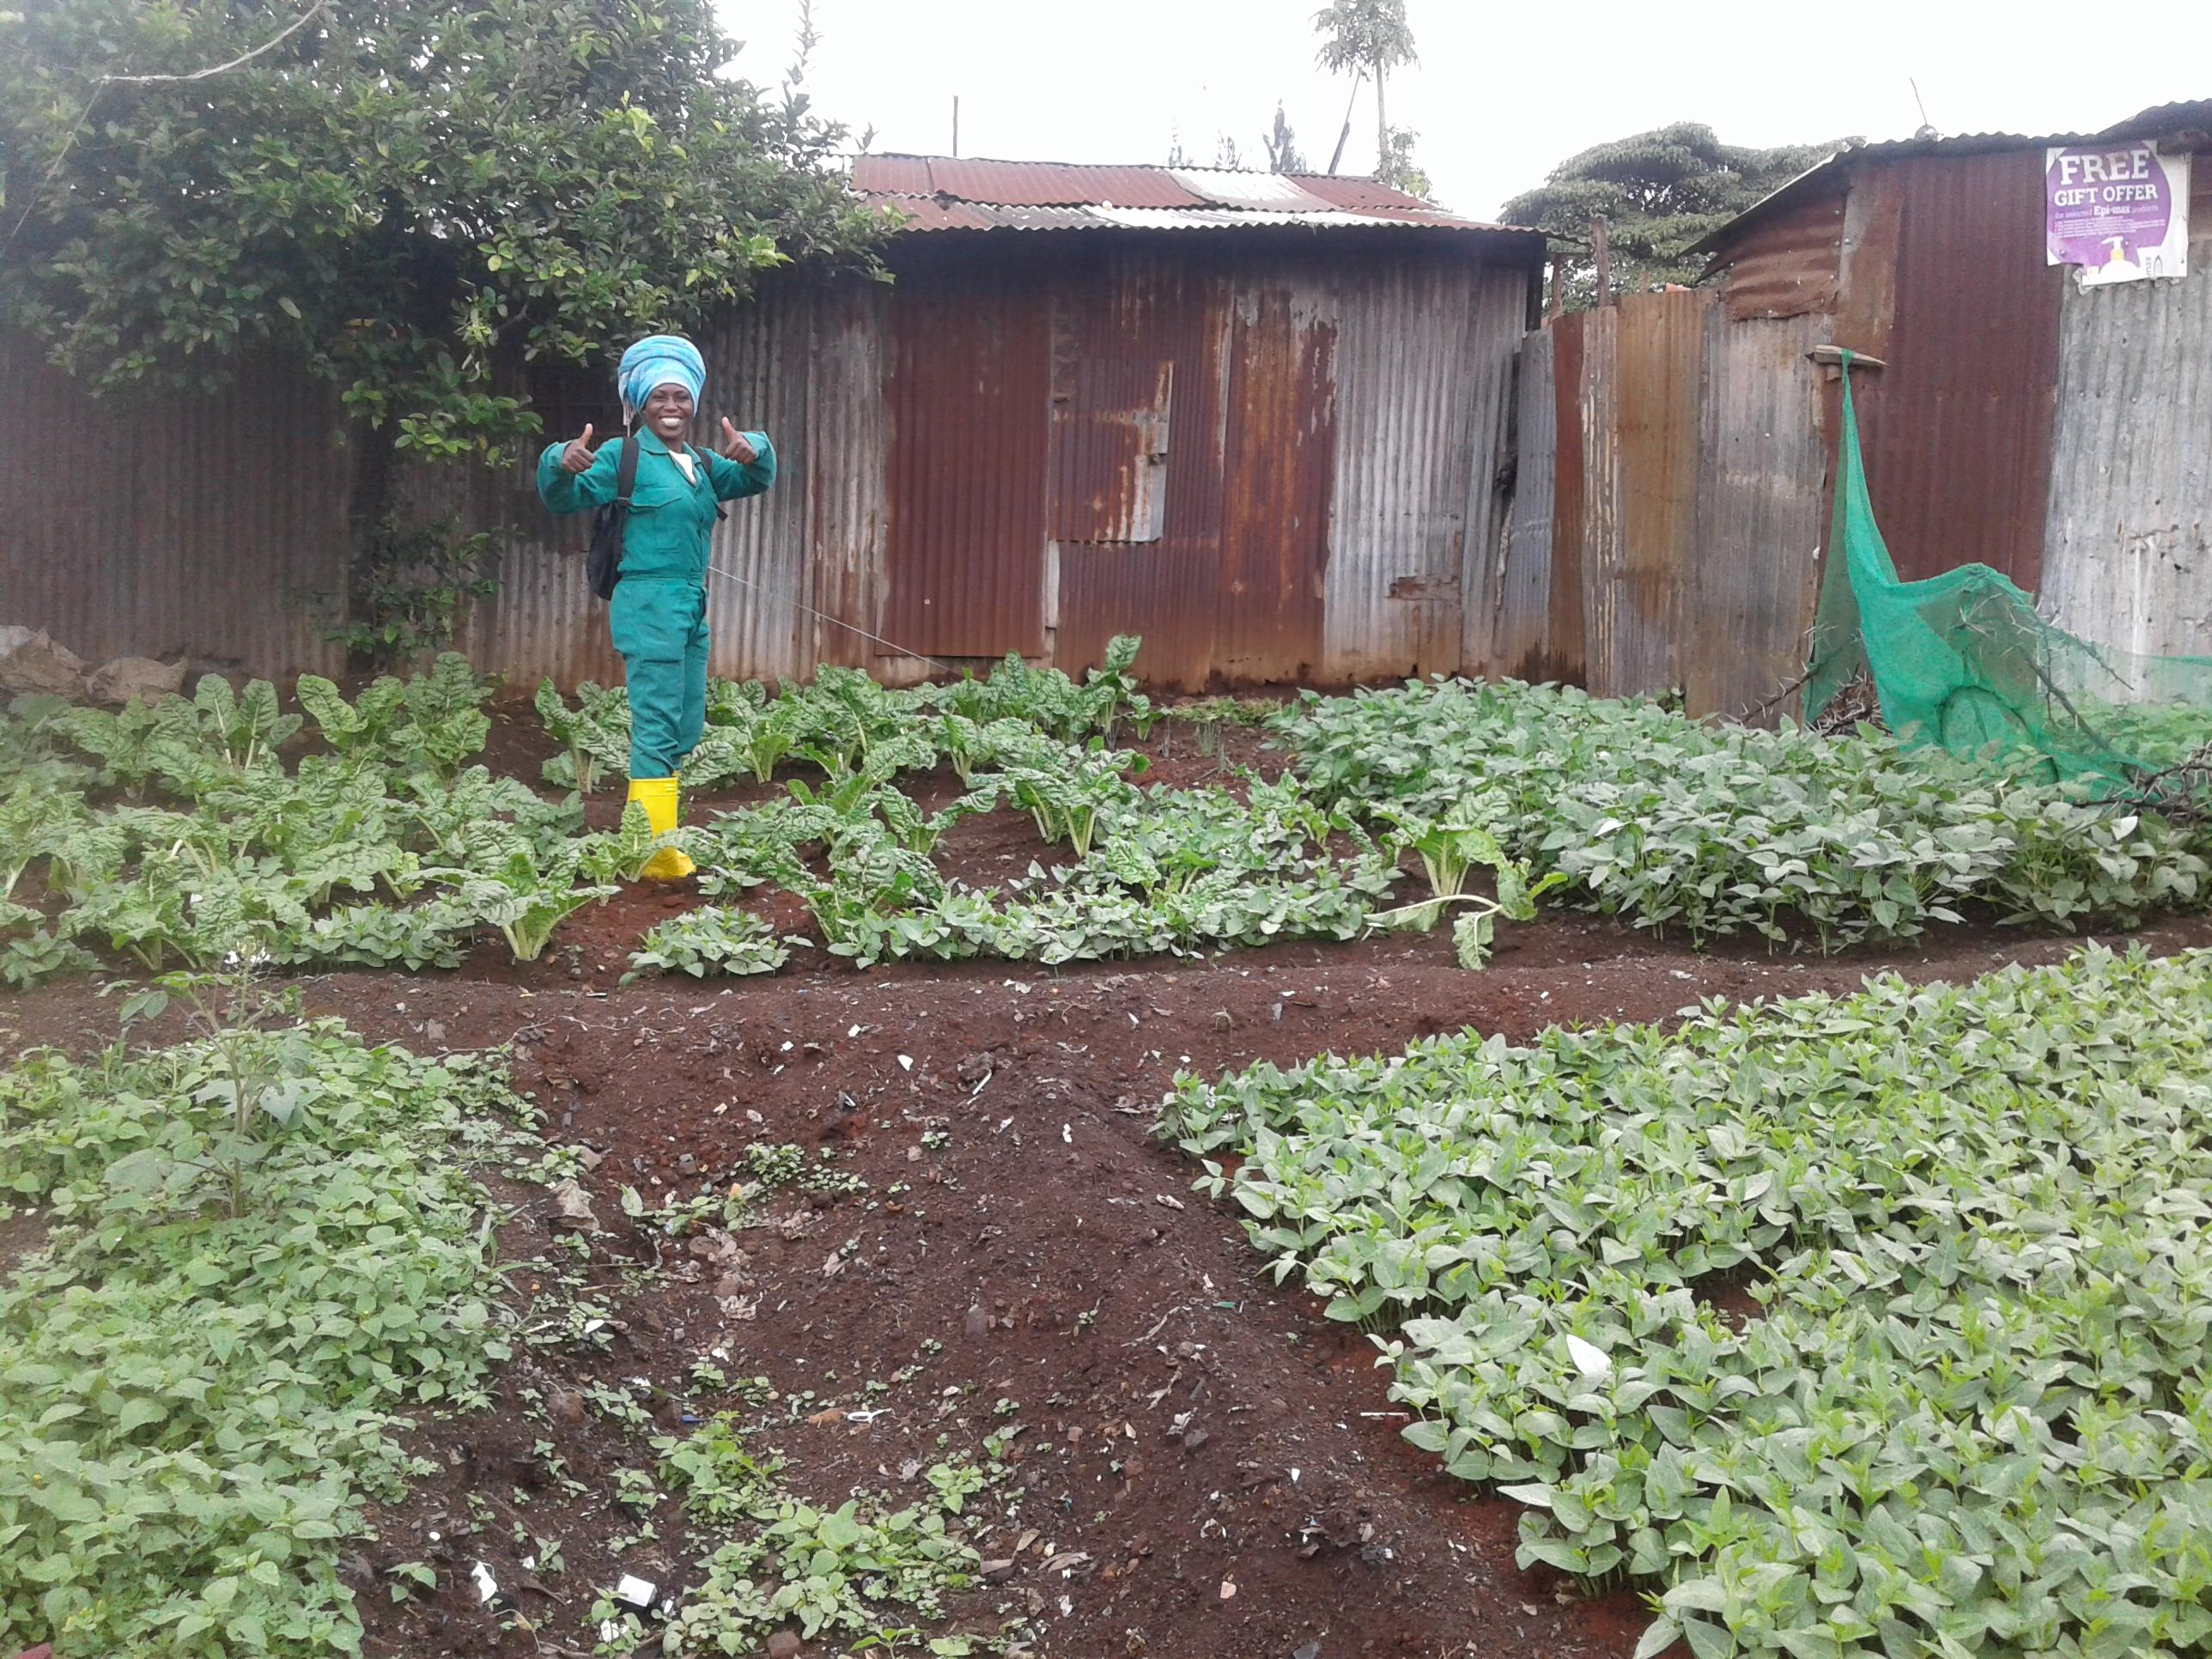 Debora Ogollah in the vegetable polt to feed the kids in Korogocho slum, Nairobi. Copyright Rupi Mangat